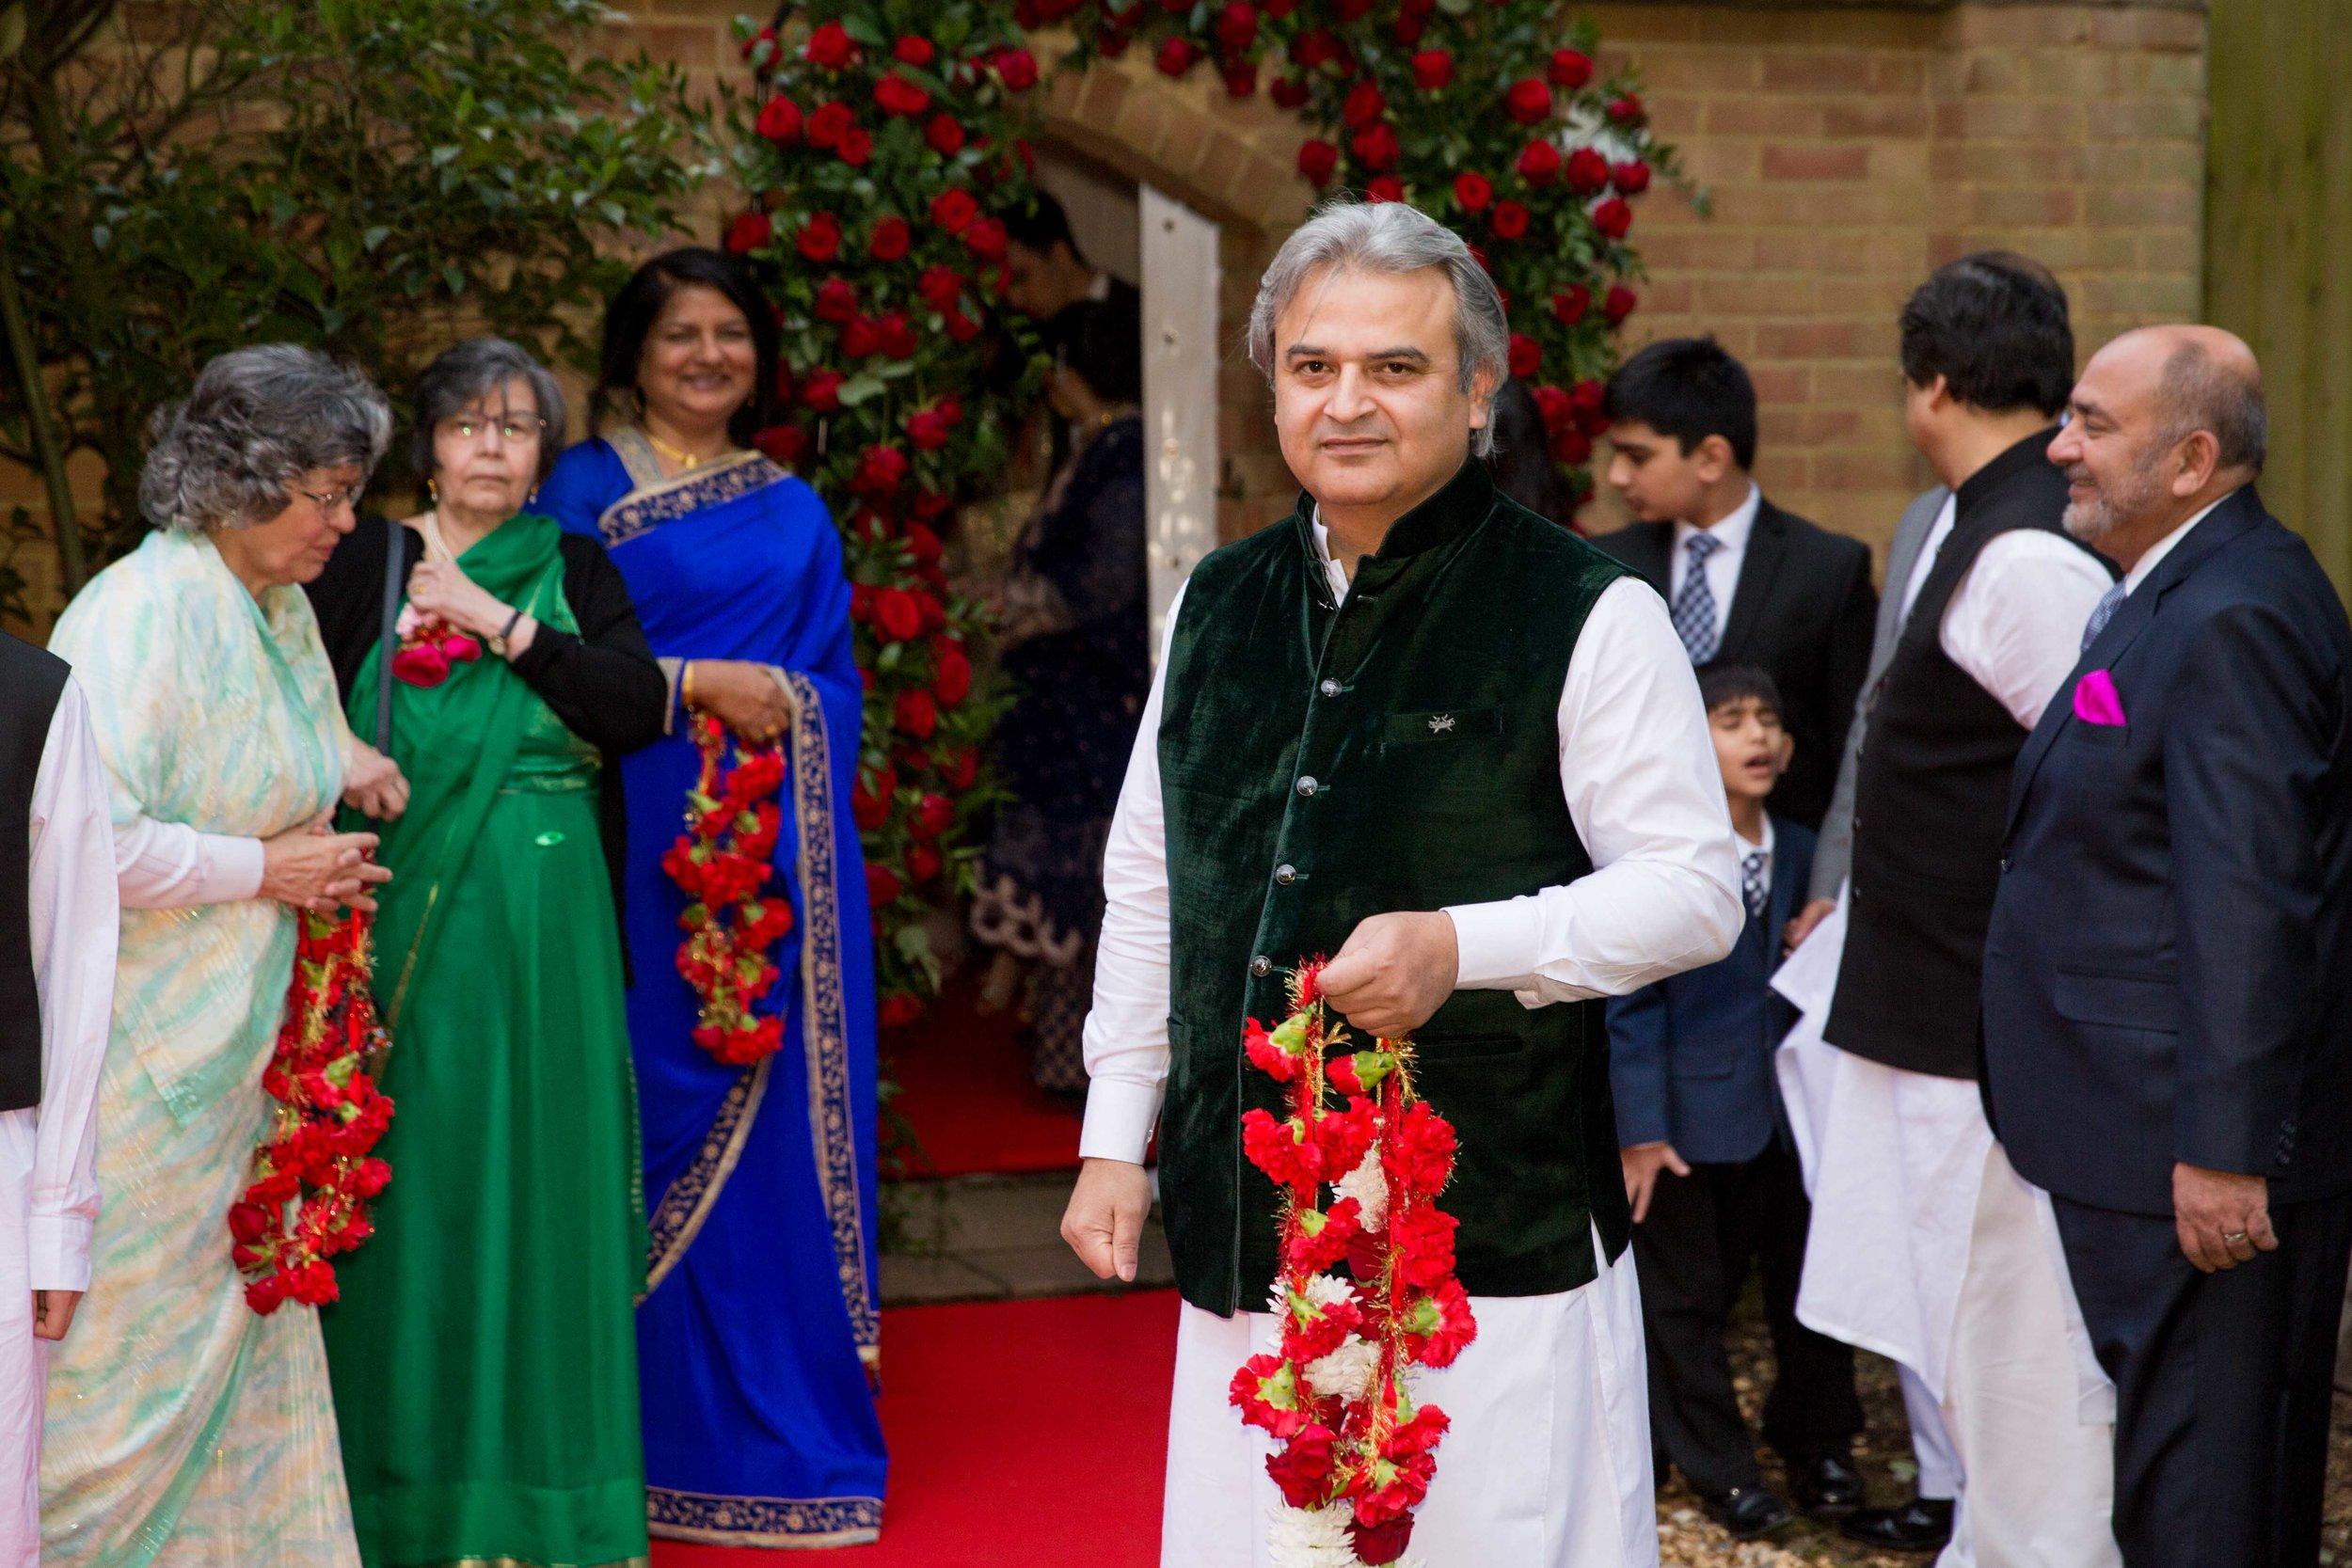 Macdonald-Berystede-Hotel-wedding-female-asian-wedding-photographer-london-natalia-smith-photography-35.jpg